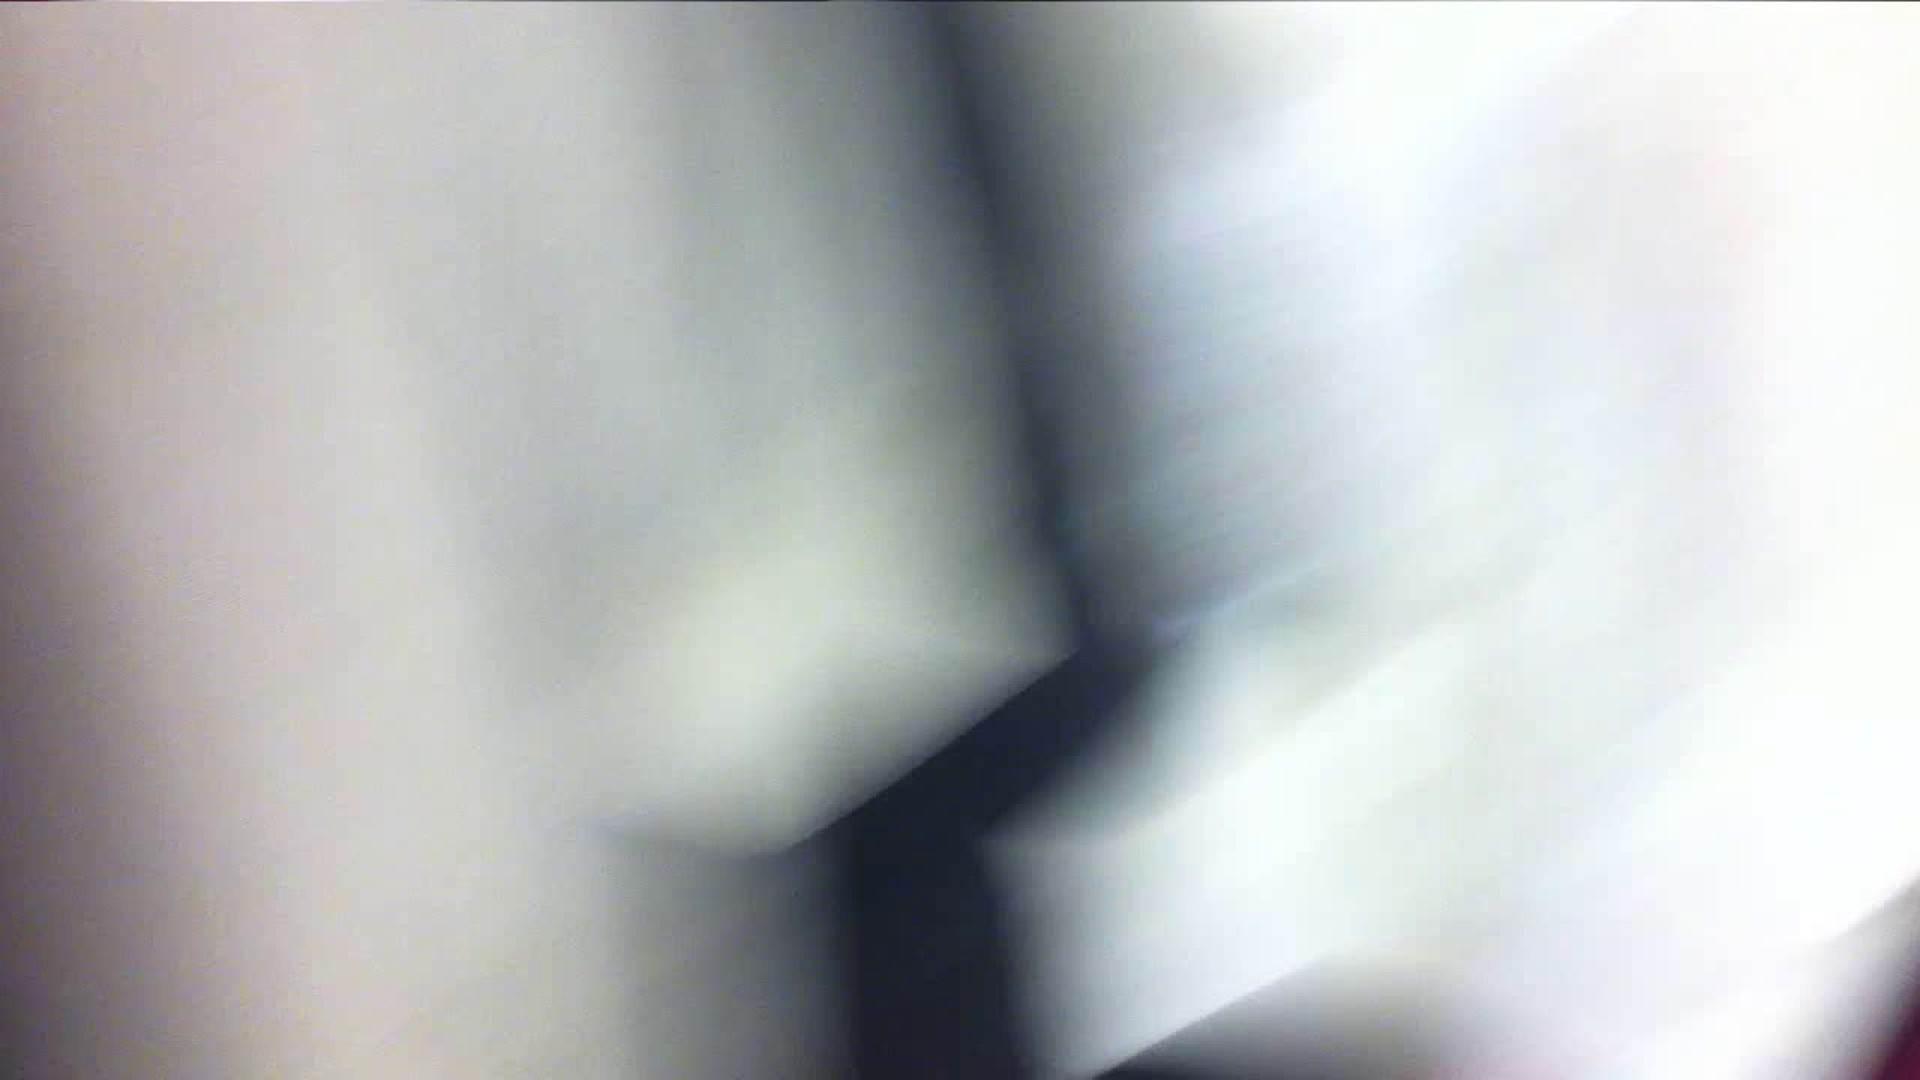 vol.33 美人アパレル胸チラ&パンチラ ギャル系ネーチャンの下着 接写 ワレメ動画紹介 53枚 4